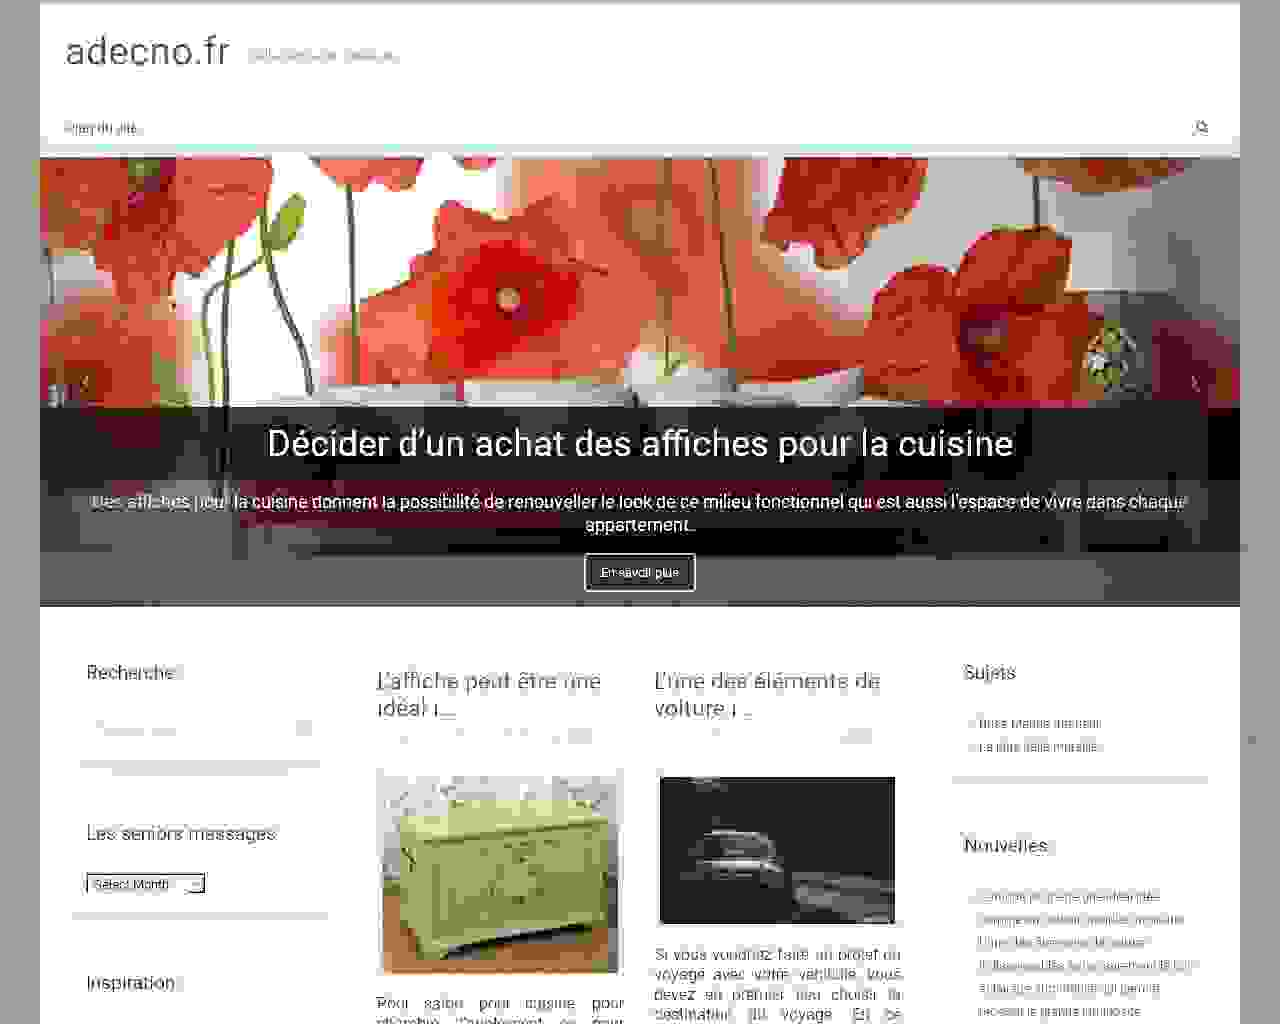 Association des Eleveurs du Cheval Normand (ADECNO)